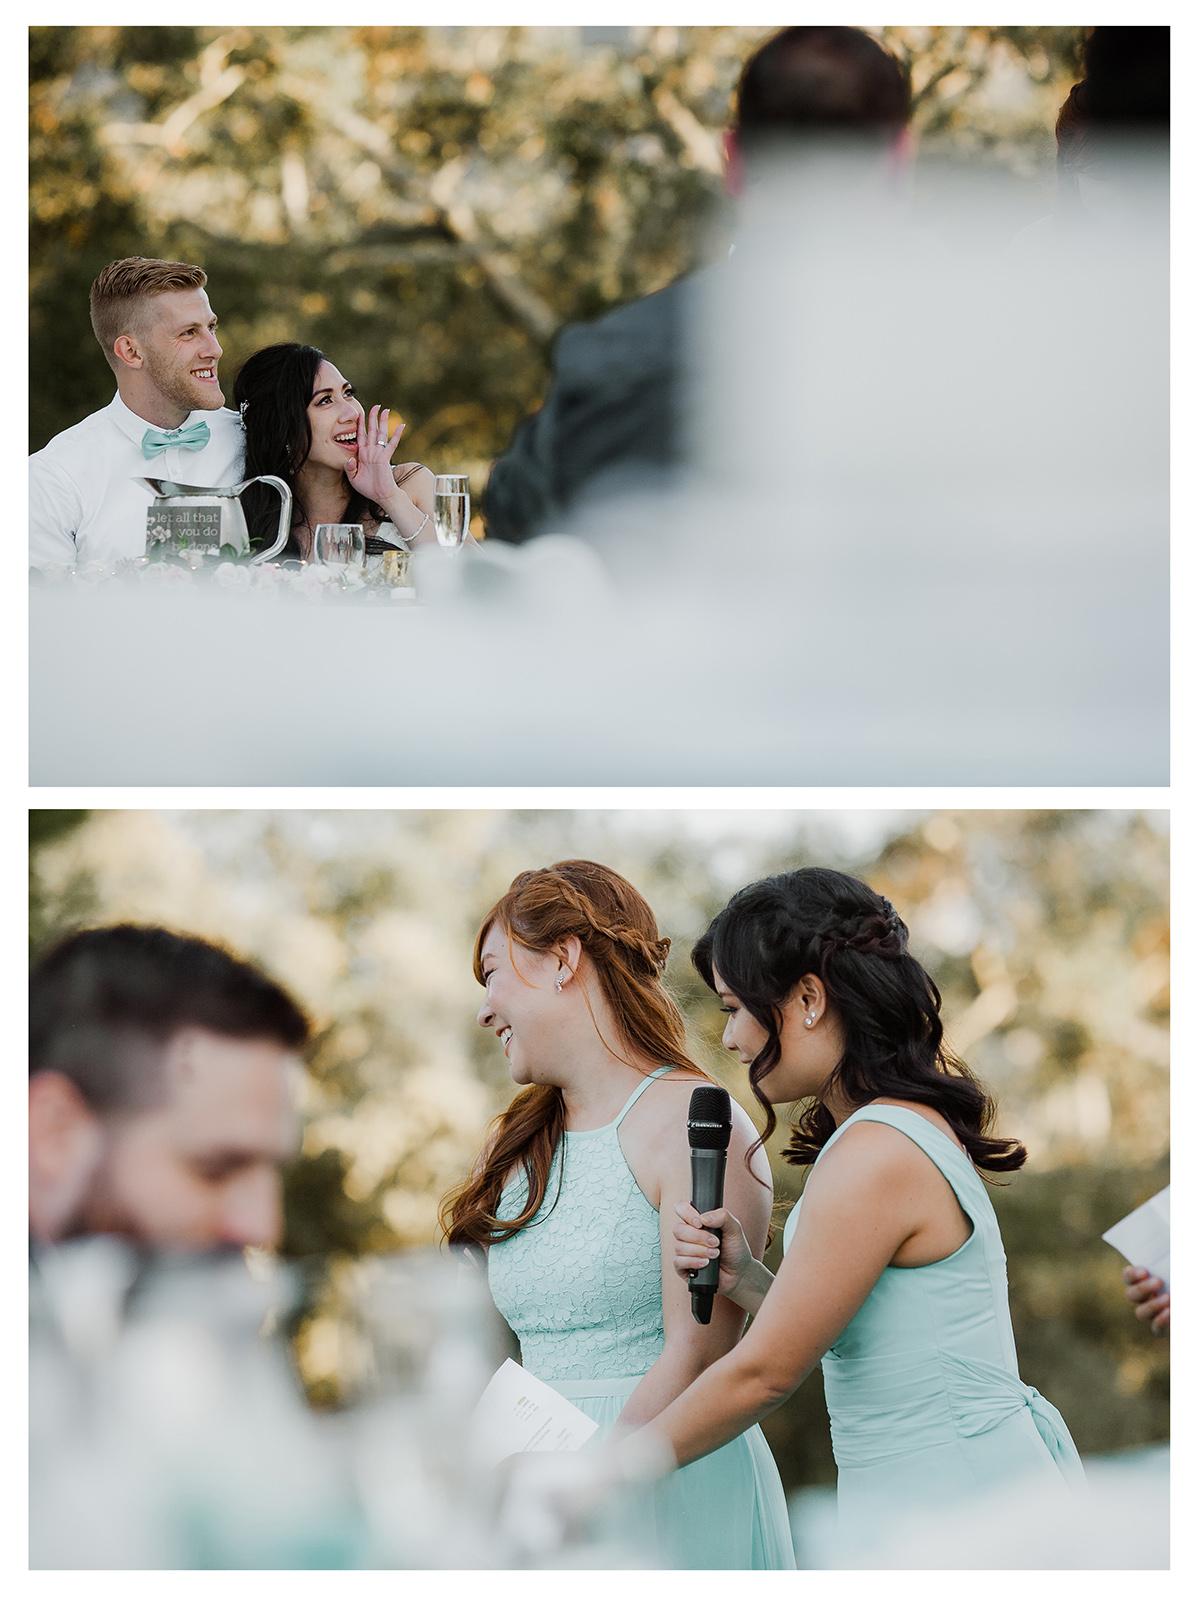 kristine_robert_wedding097.jpg